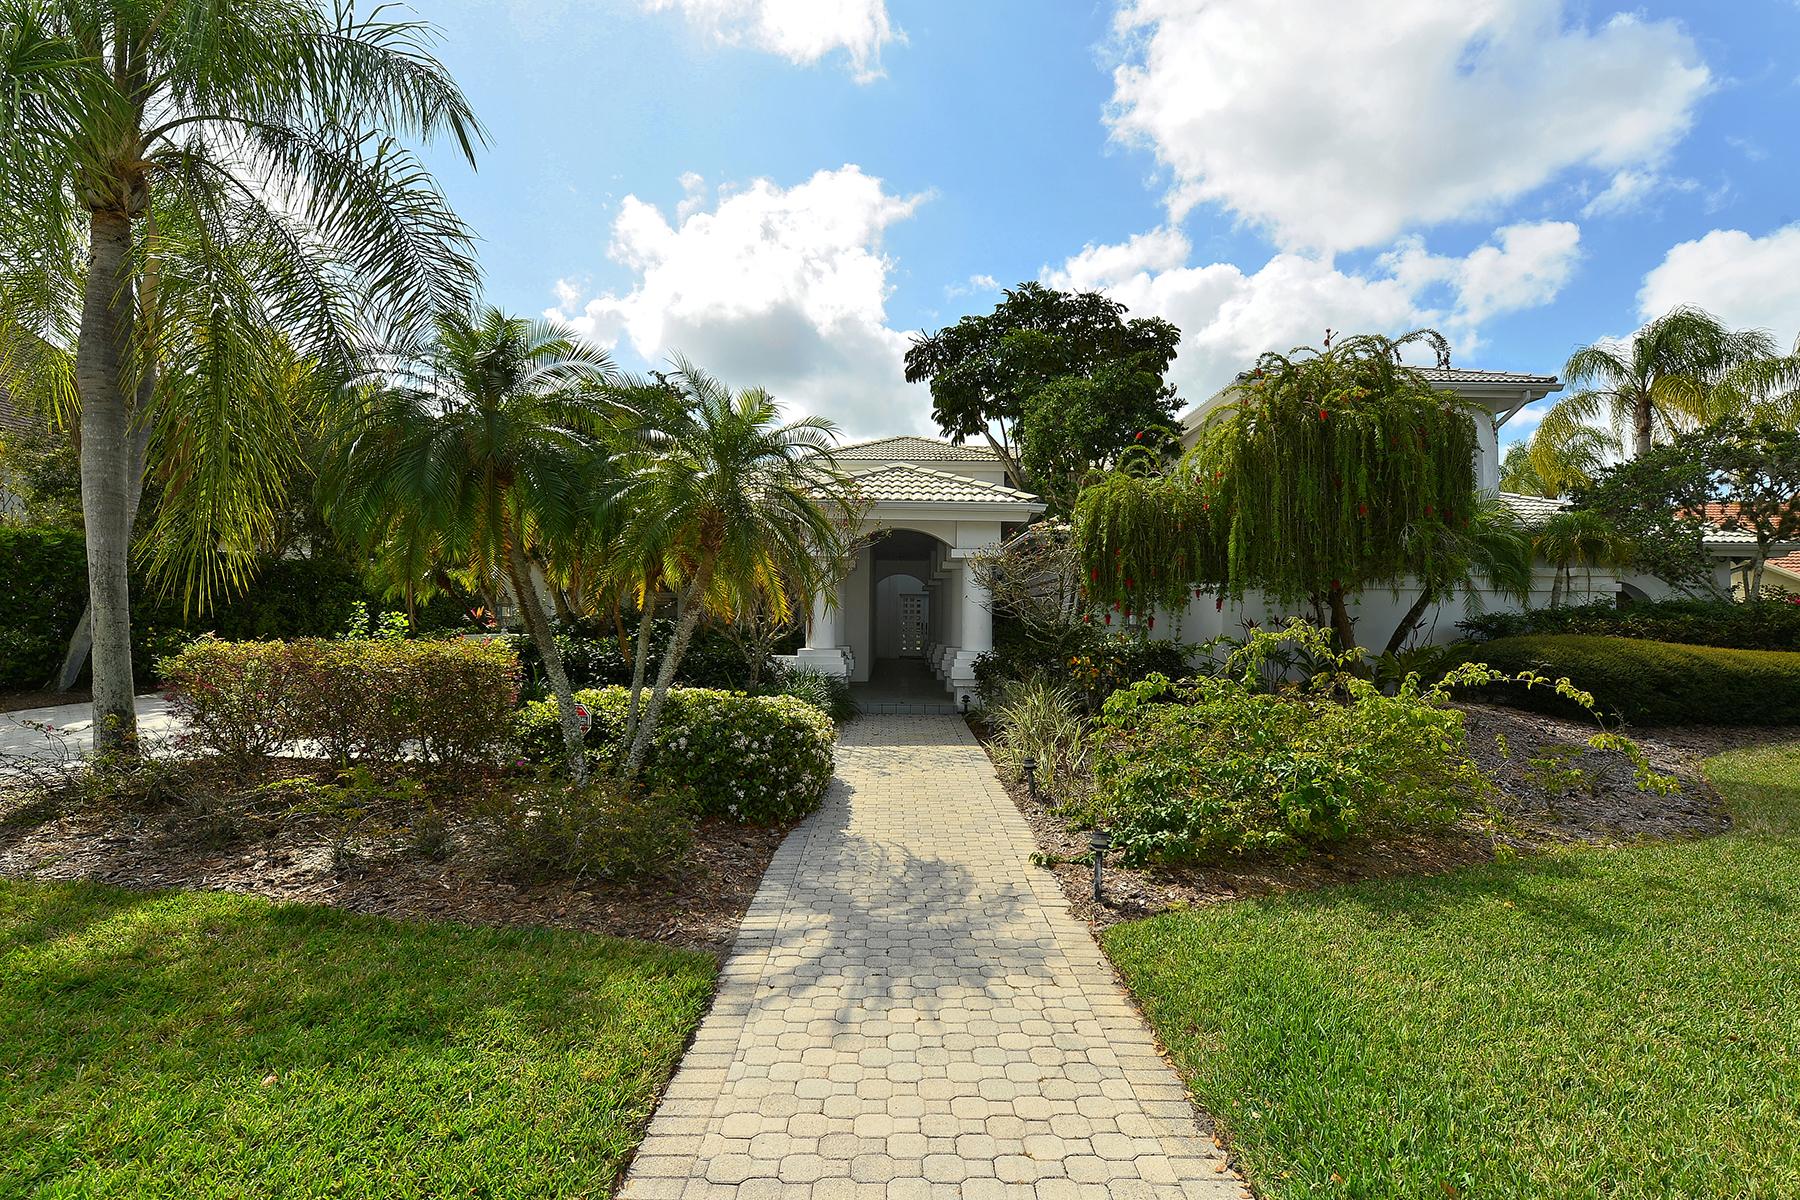 Casa Unifamiliar por un Venta en PRESTANCIA 4175 Escondito Cir Sarasota, Florida, 34238 Estados Unidos